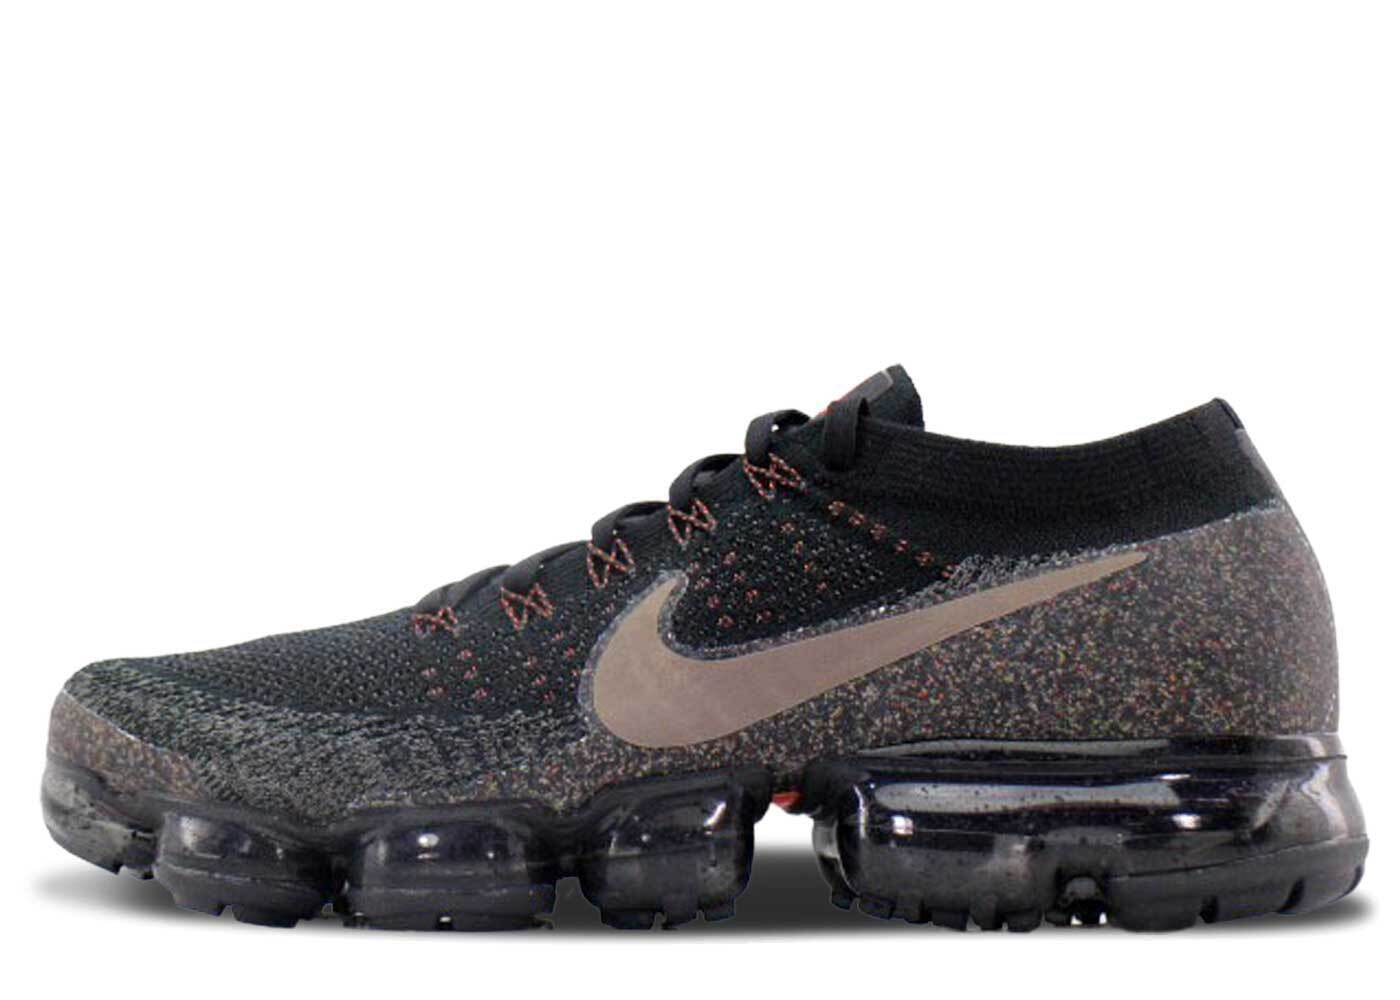 Nike Air VaporMax Black Dark Mushroom Womensの写真